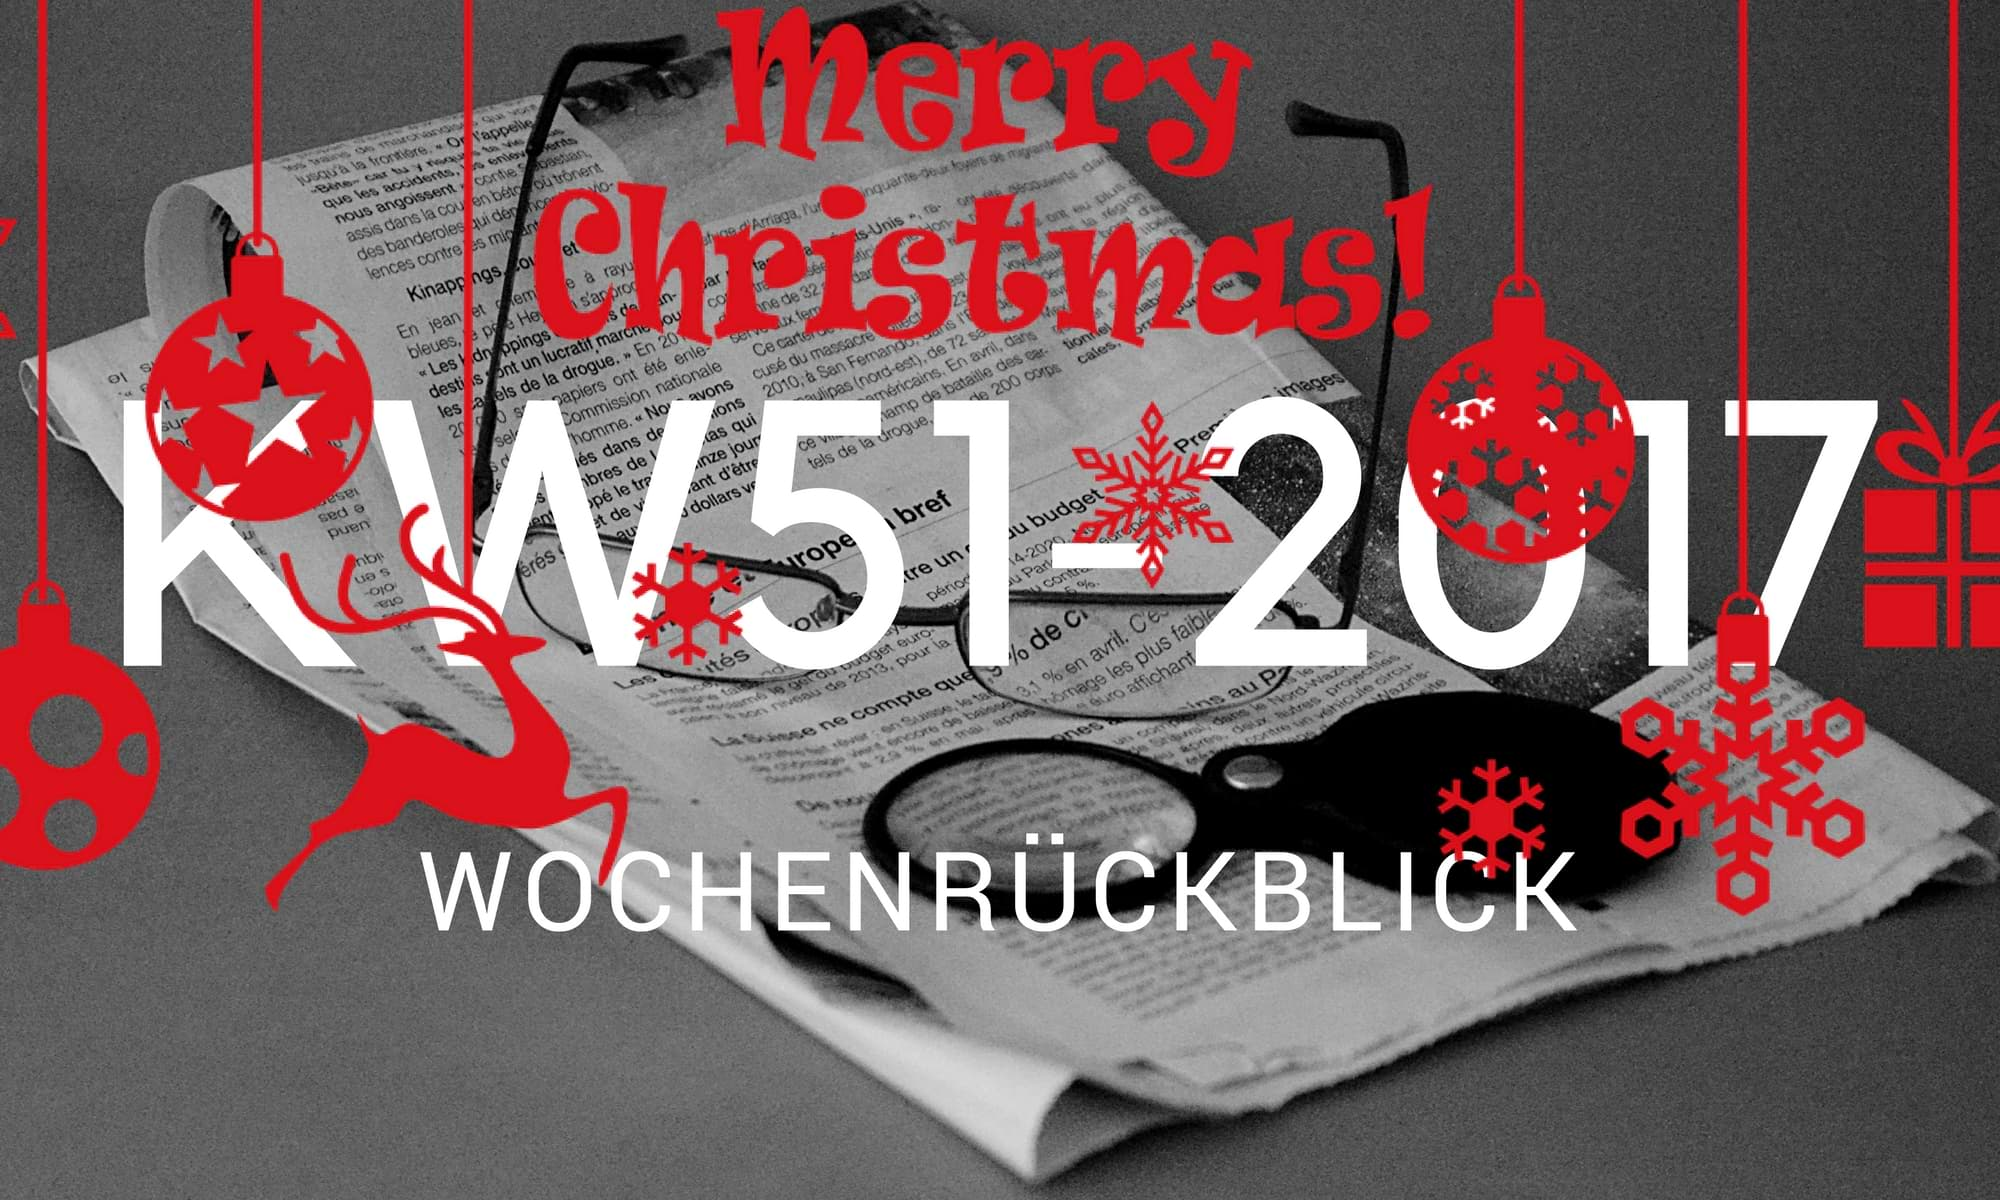 wochenrueckblick camping news KW51 2017 (1)